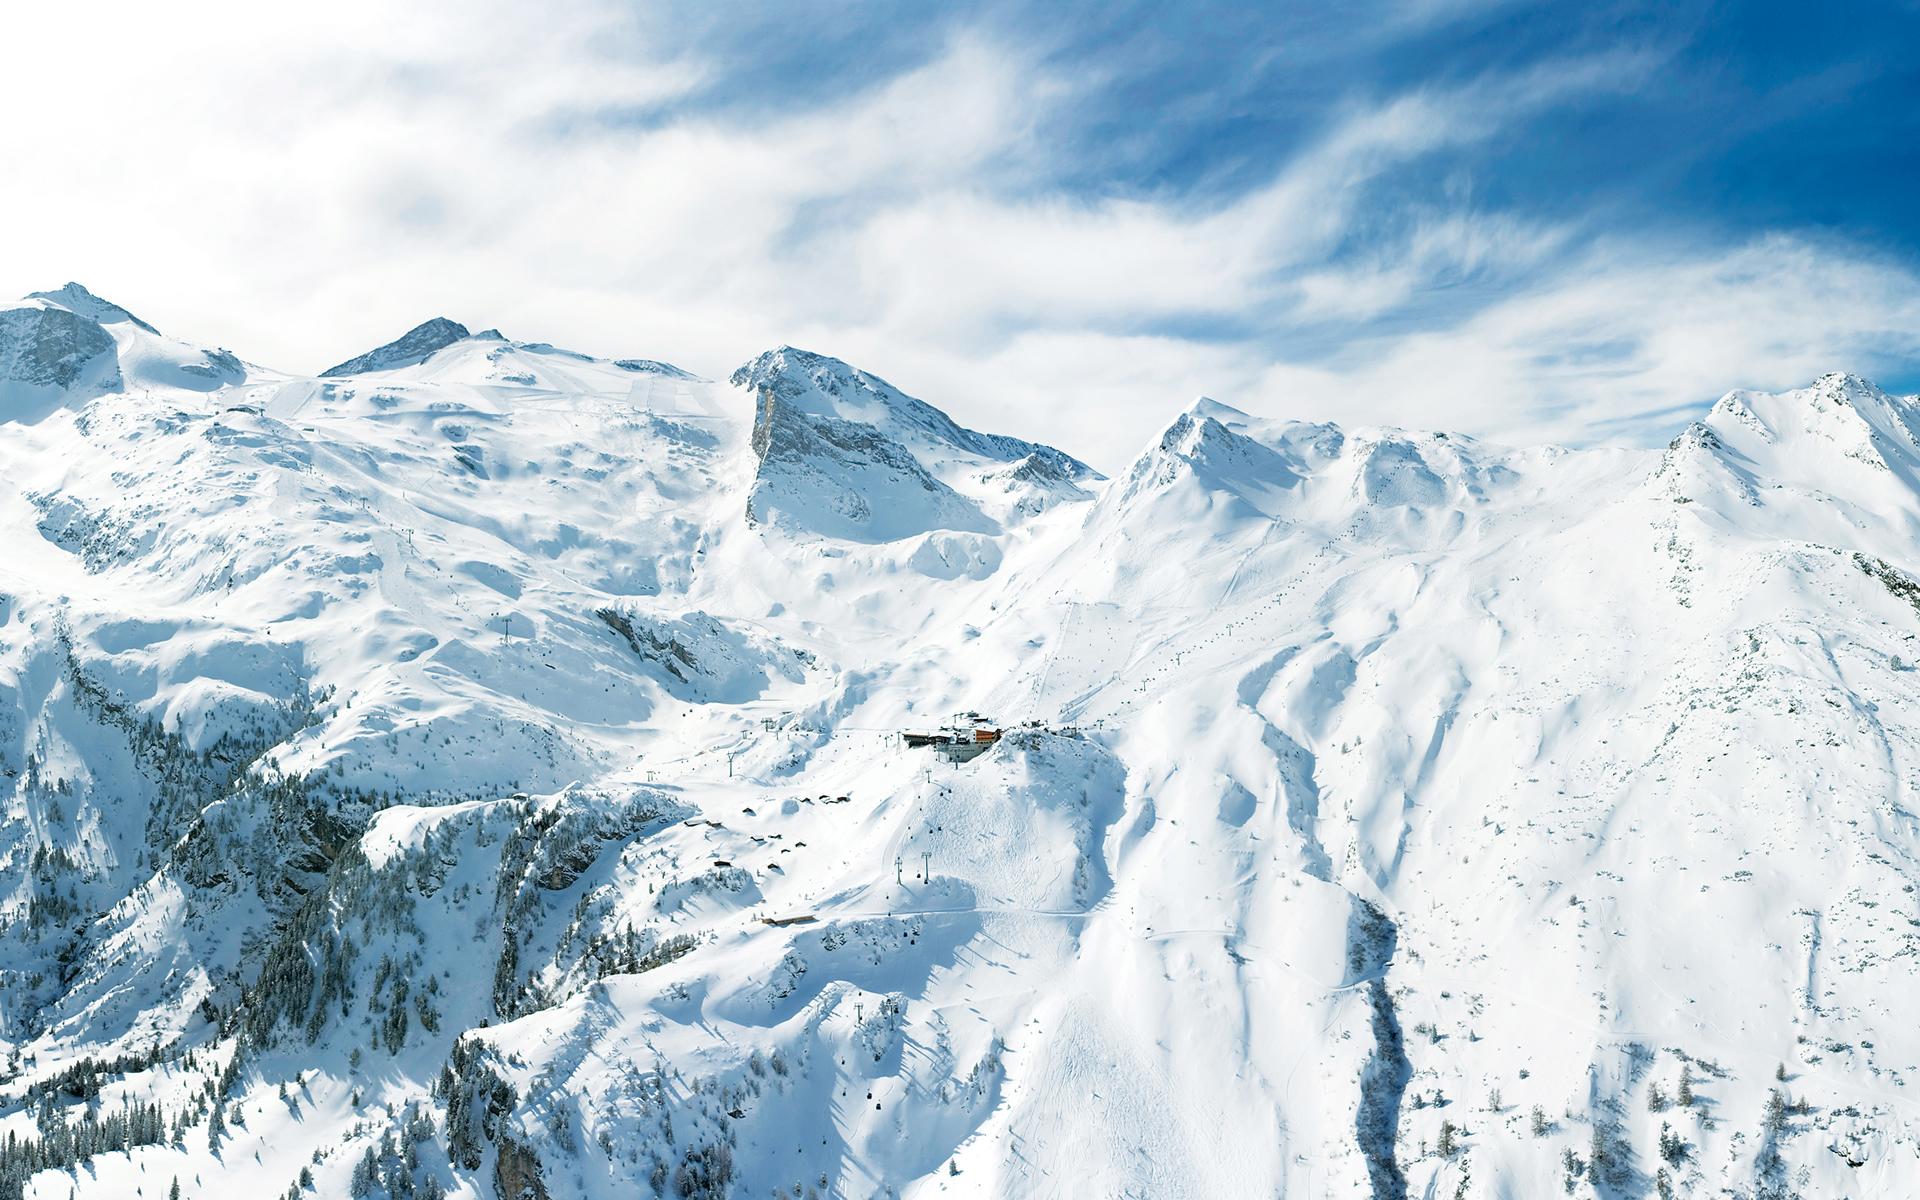 Winter Mountain wallpaper - 28609